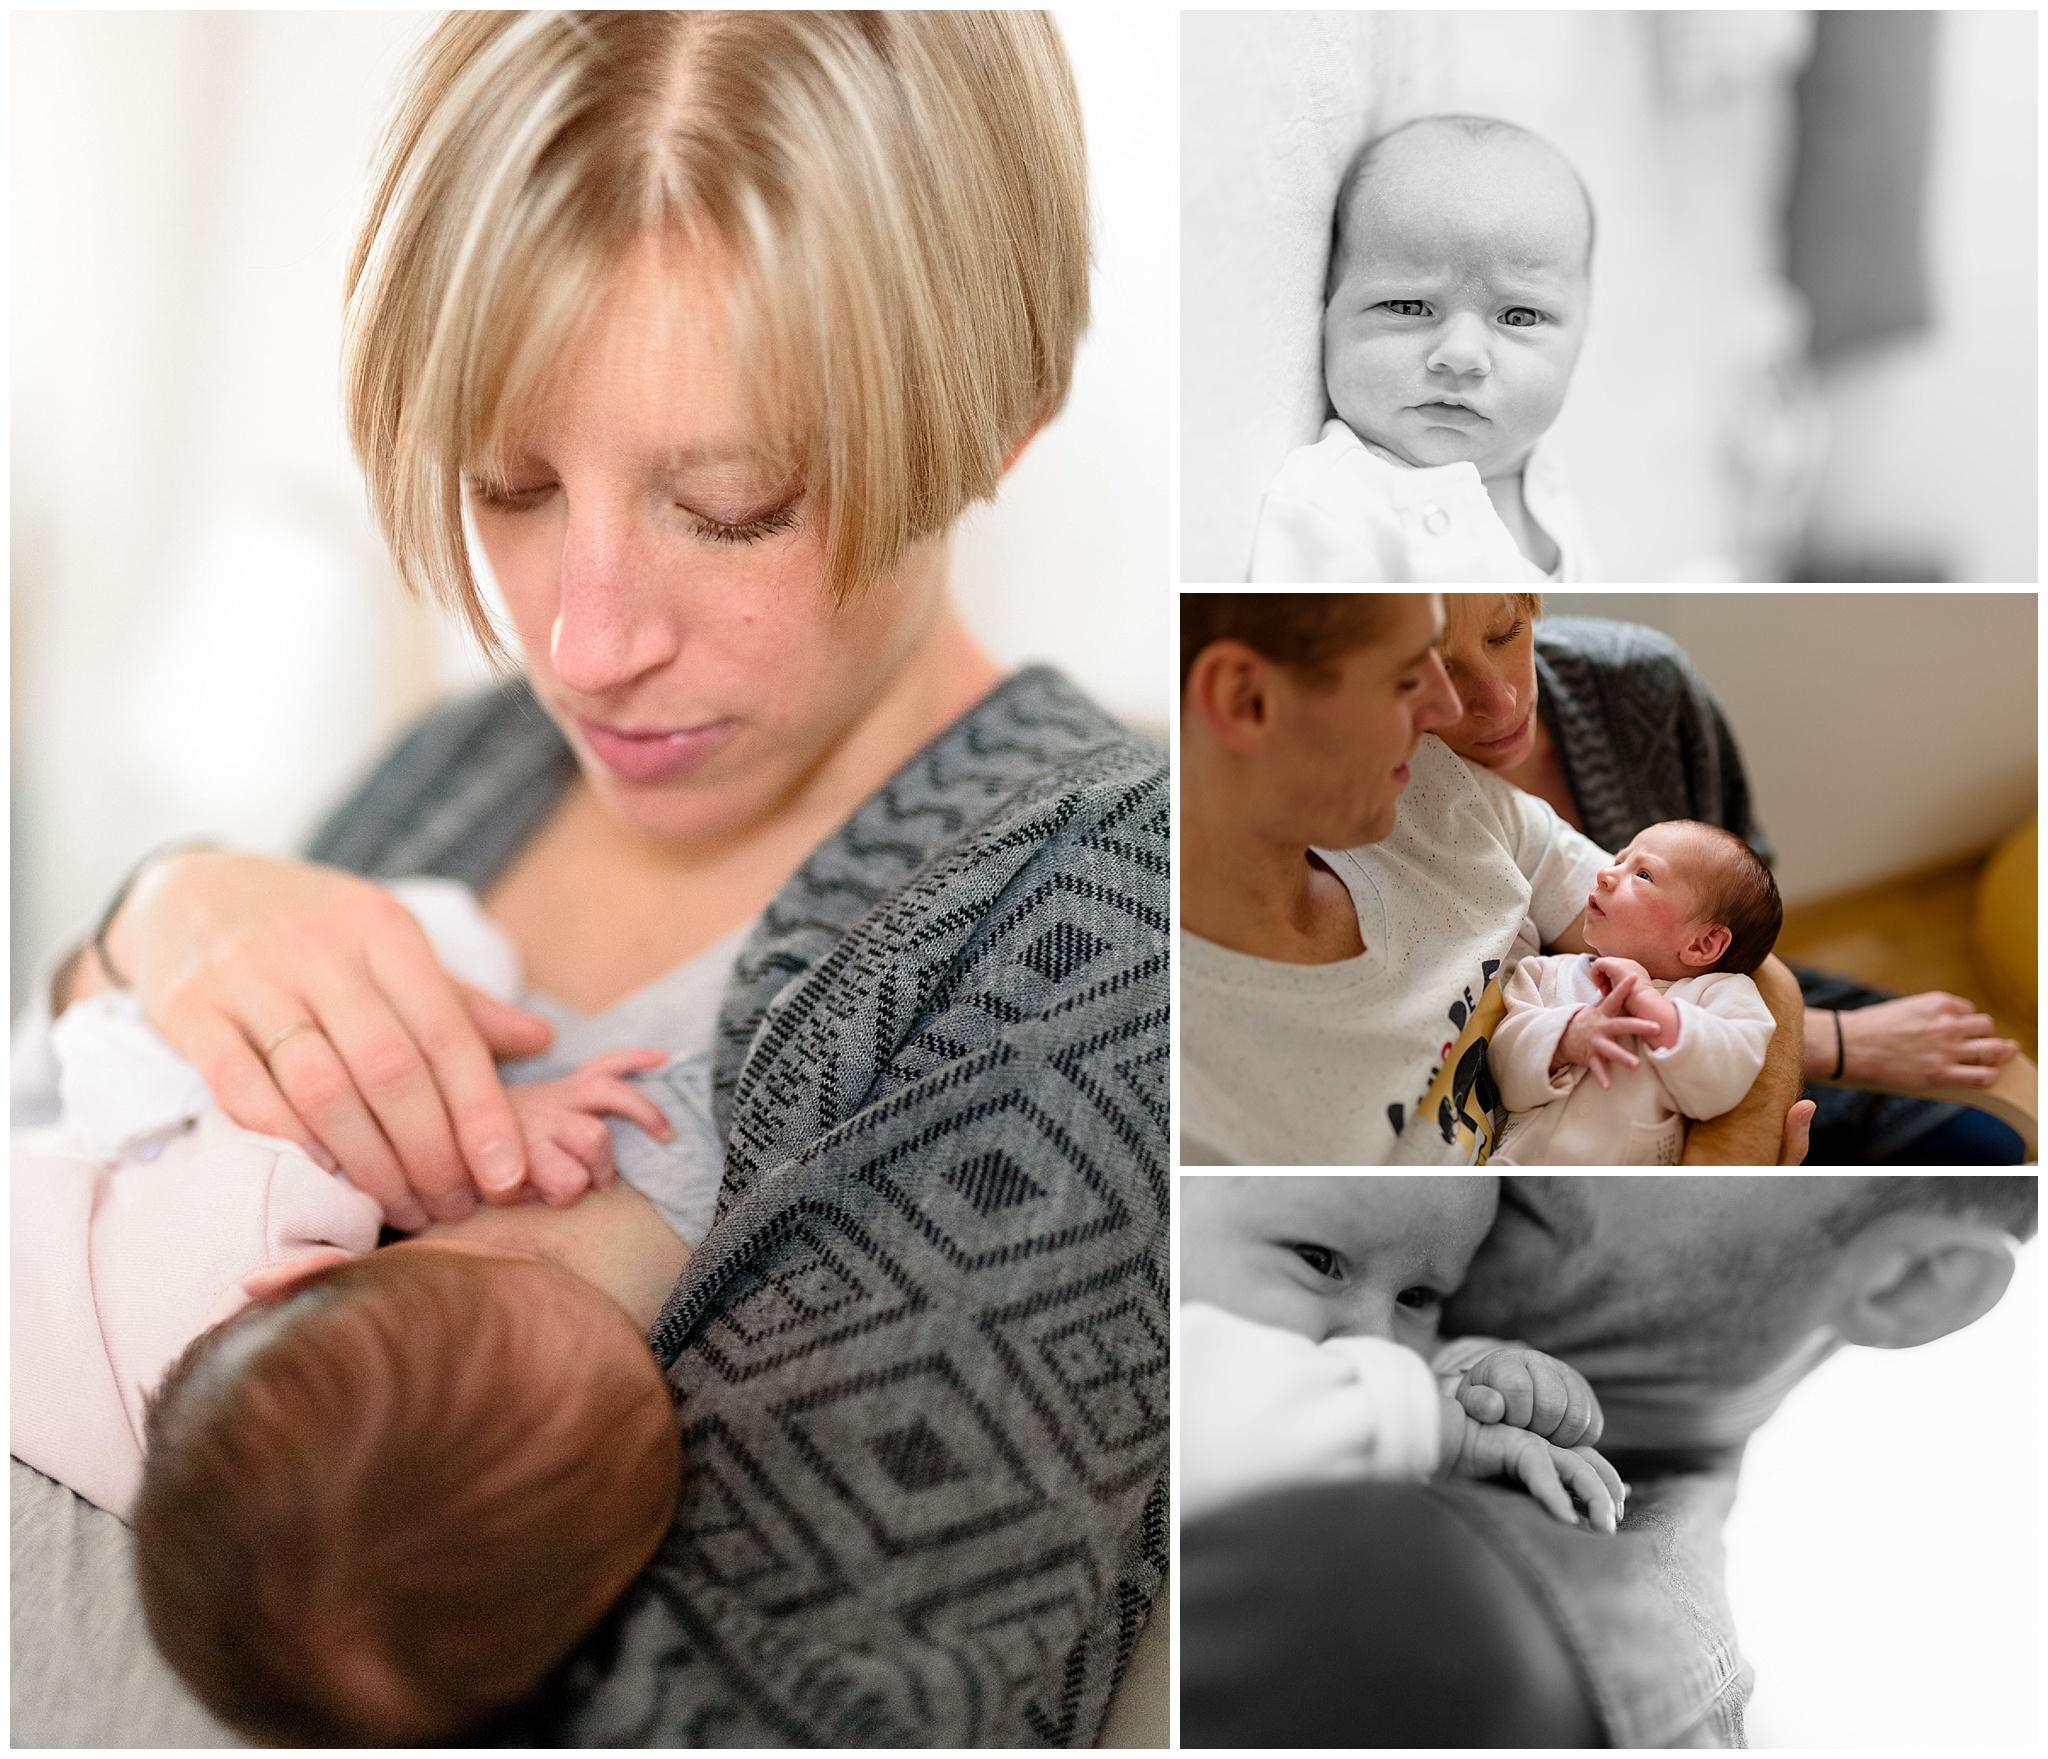 seance photo domicile photographe bébé famille Yvelines 92 paris Sandrine Siryani